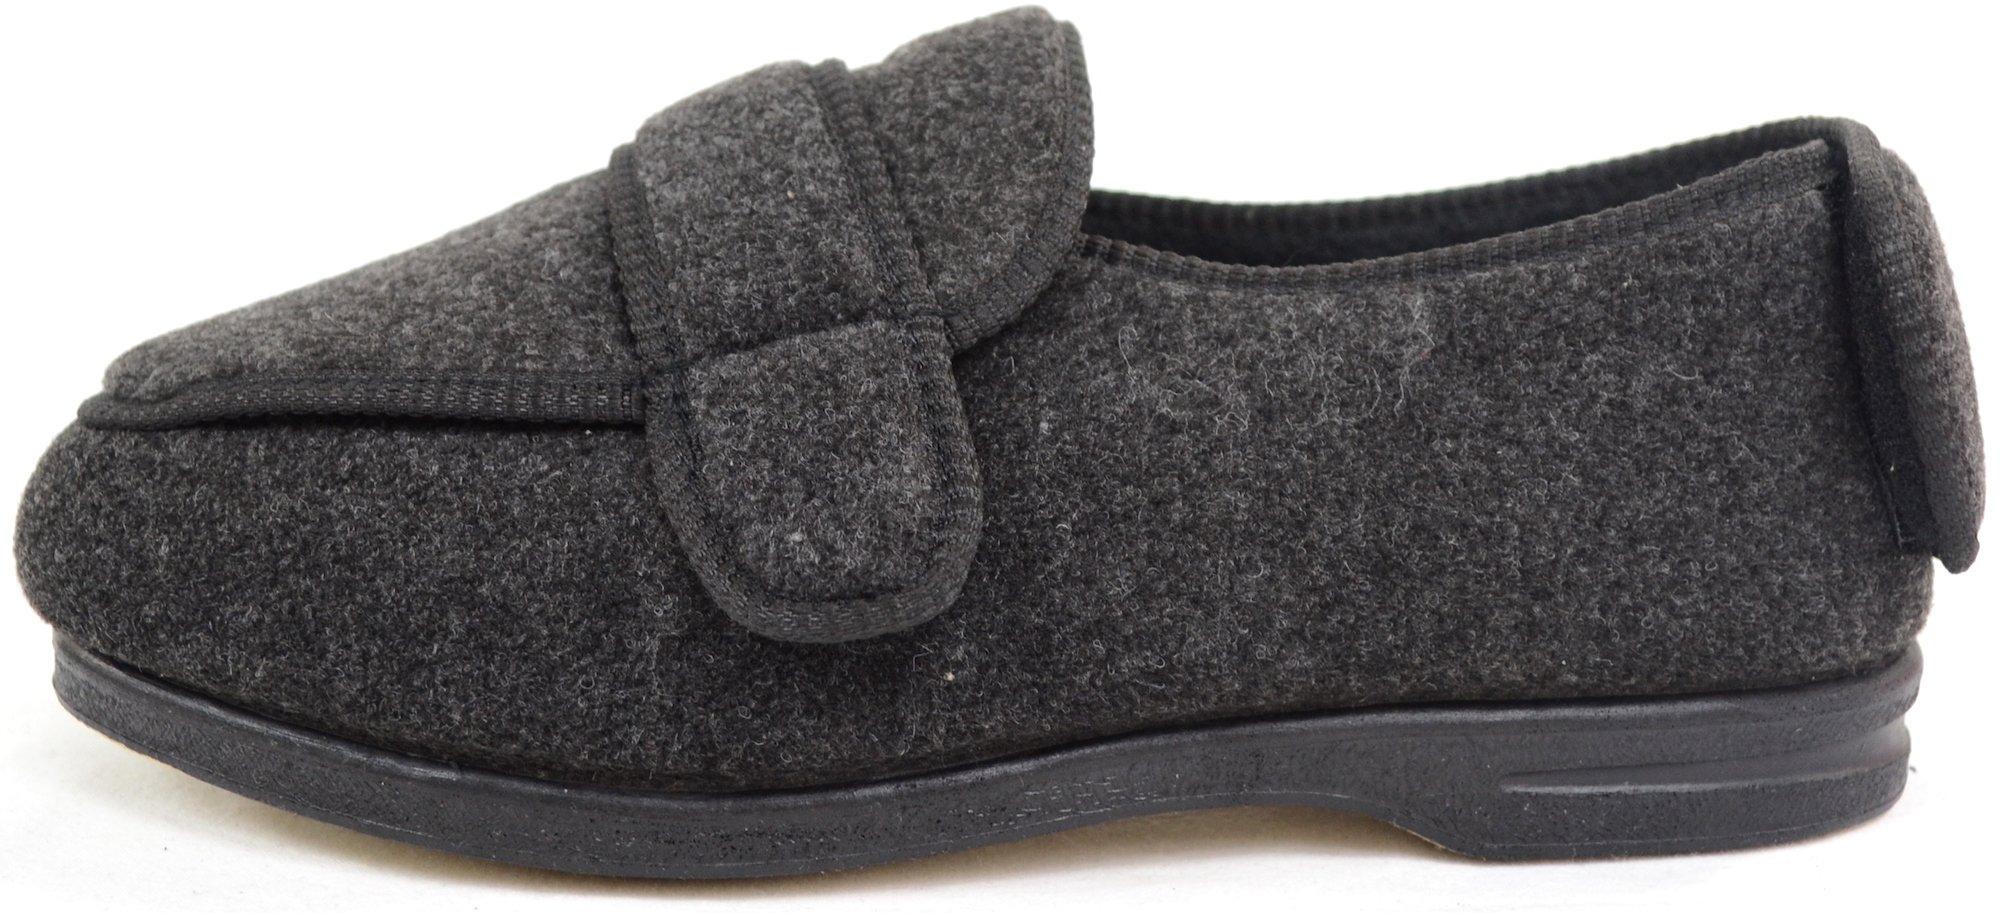 ABSOLUTE FOOTWEAR Mens Orthopaedic/Extra Wide Fit Adjustable Slipper Boot/Slippers - Grey - 10 US by ABSOLUTE FOOTWEAR (Image #5)